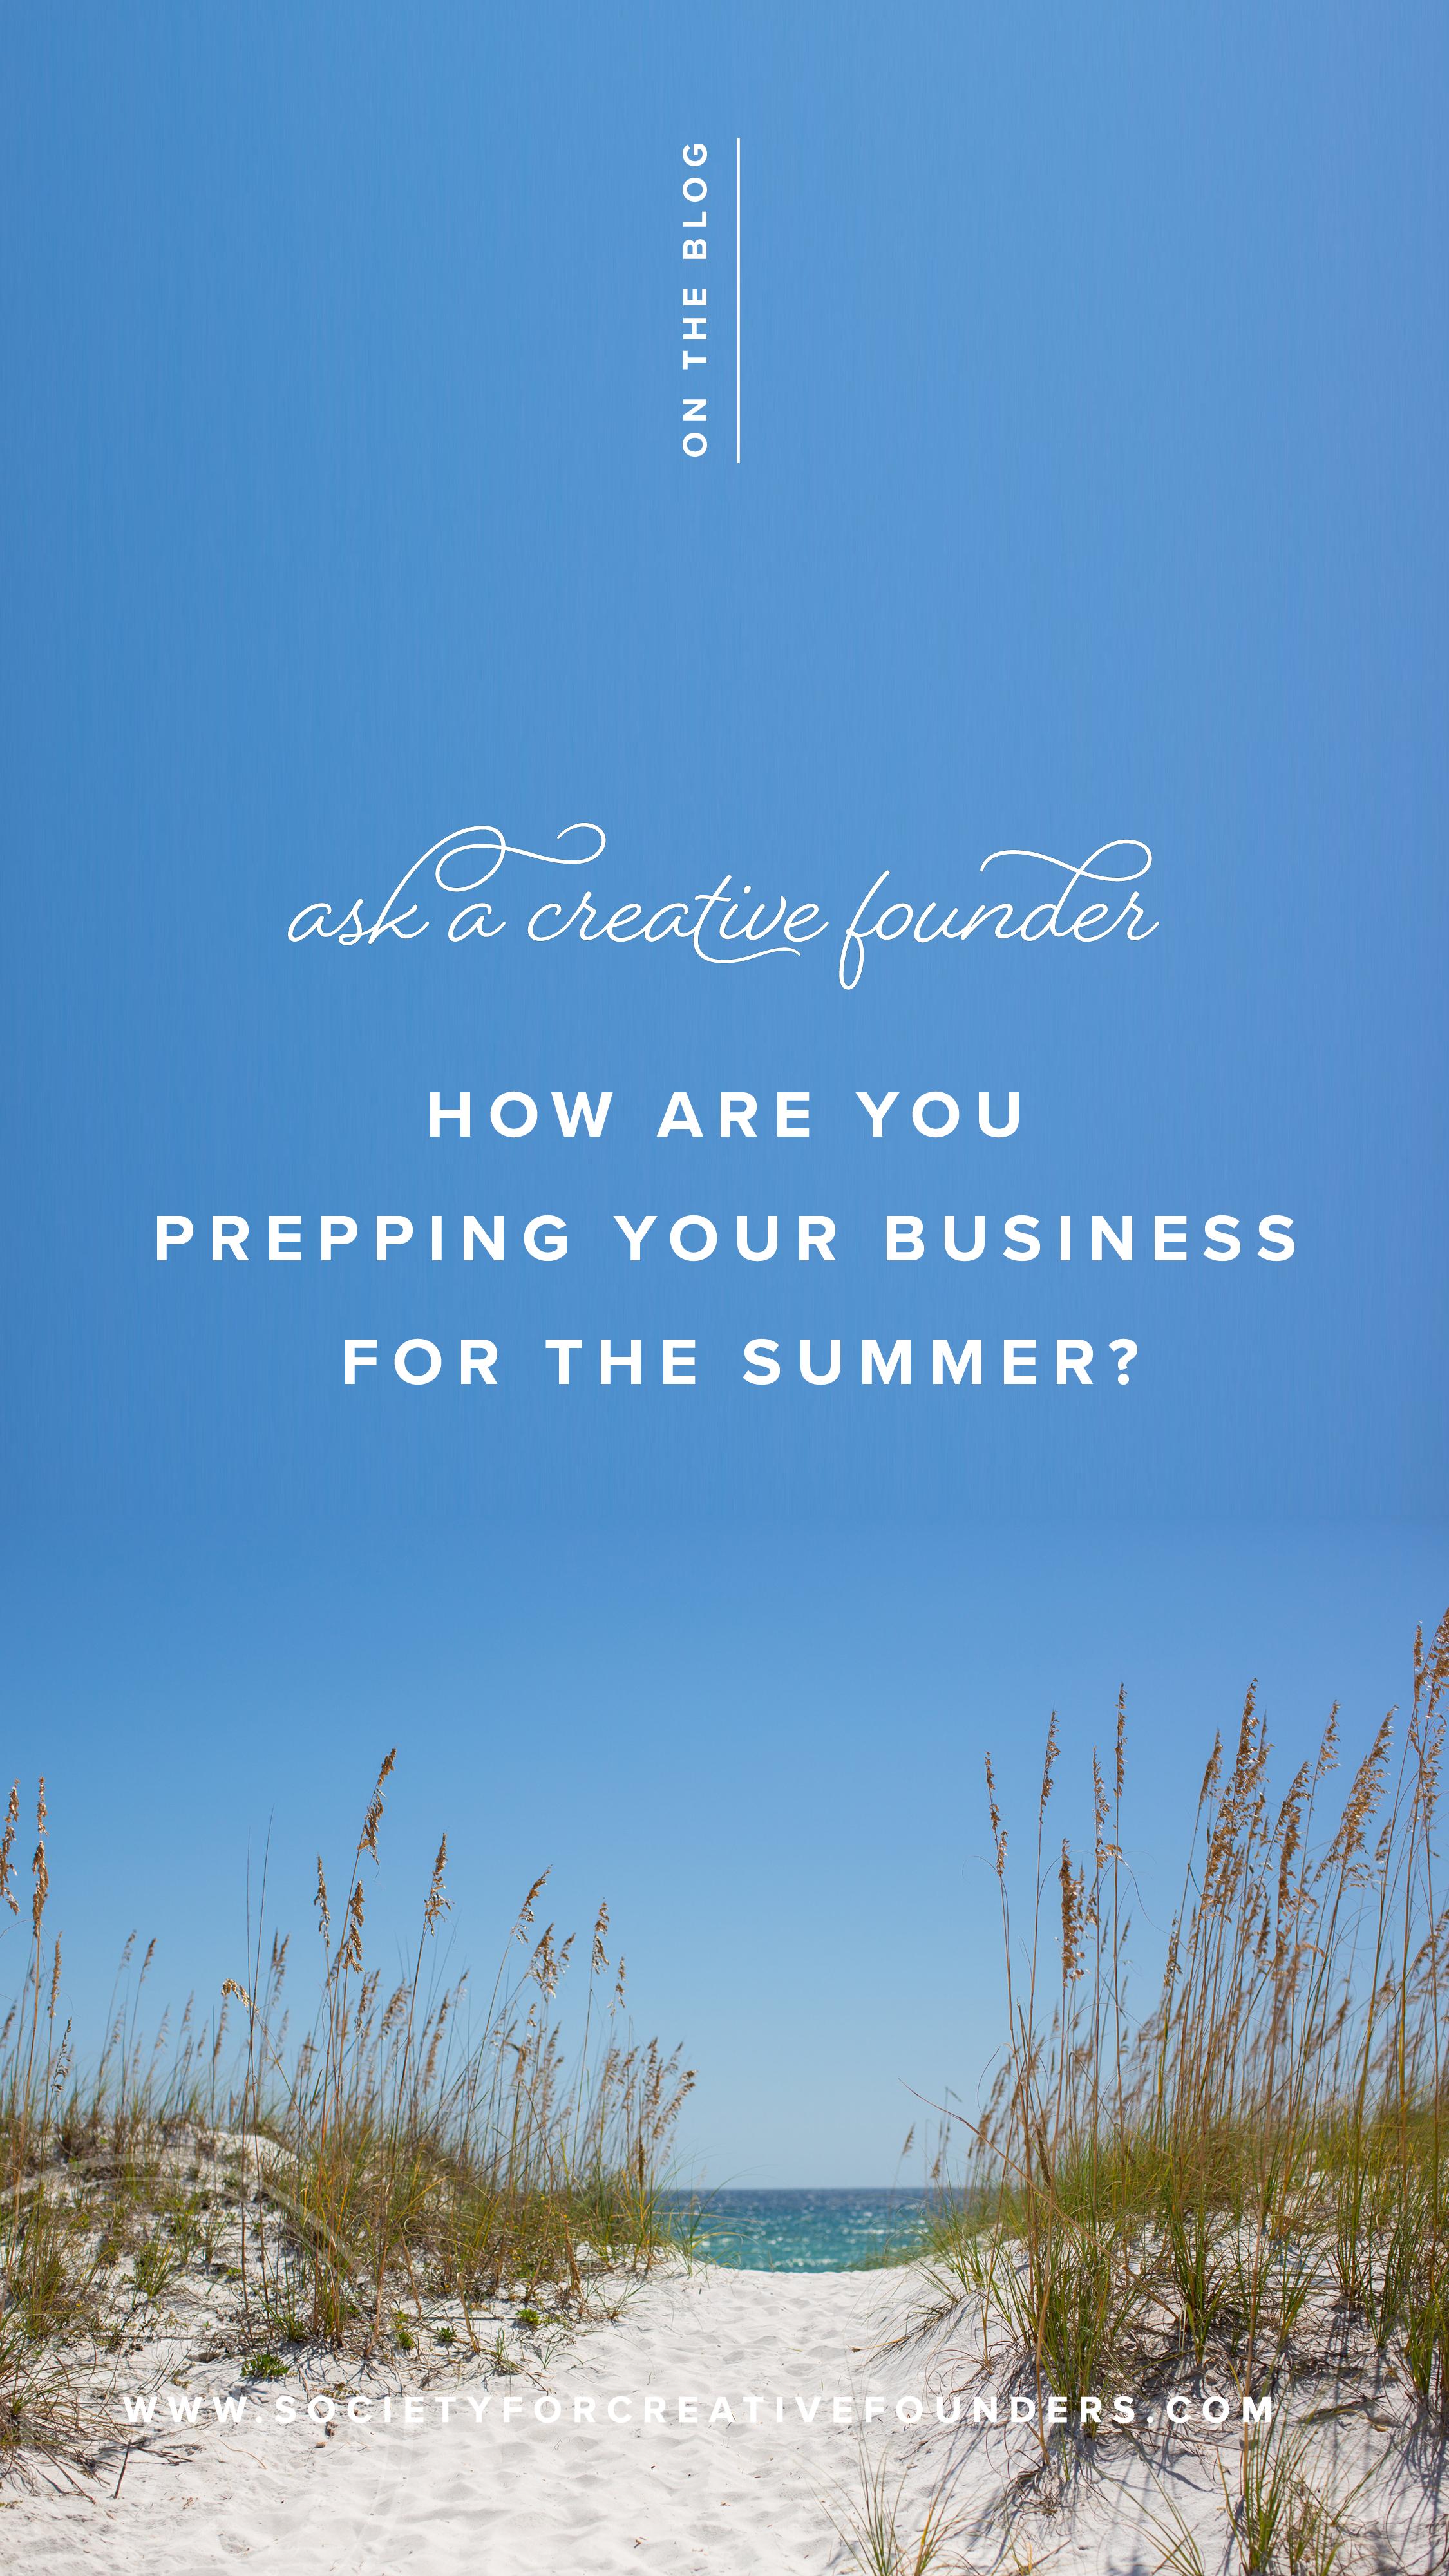 scf - 2019 Blog - ask a creative founder.png